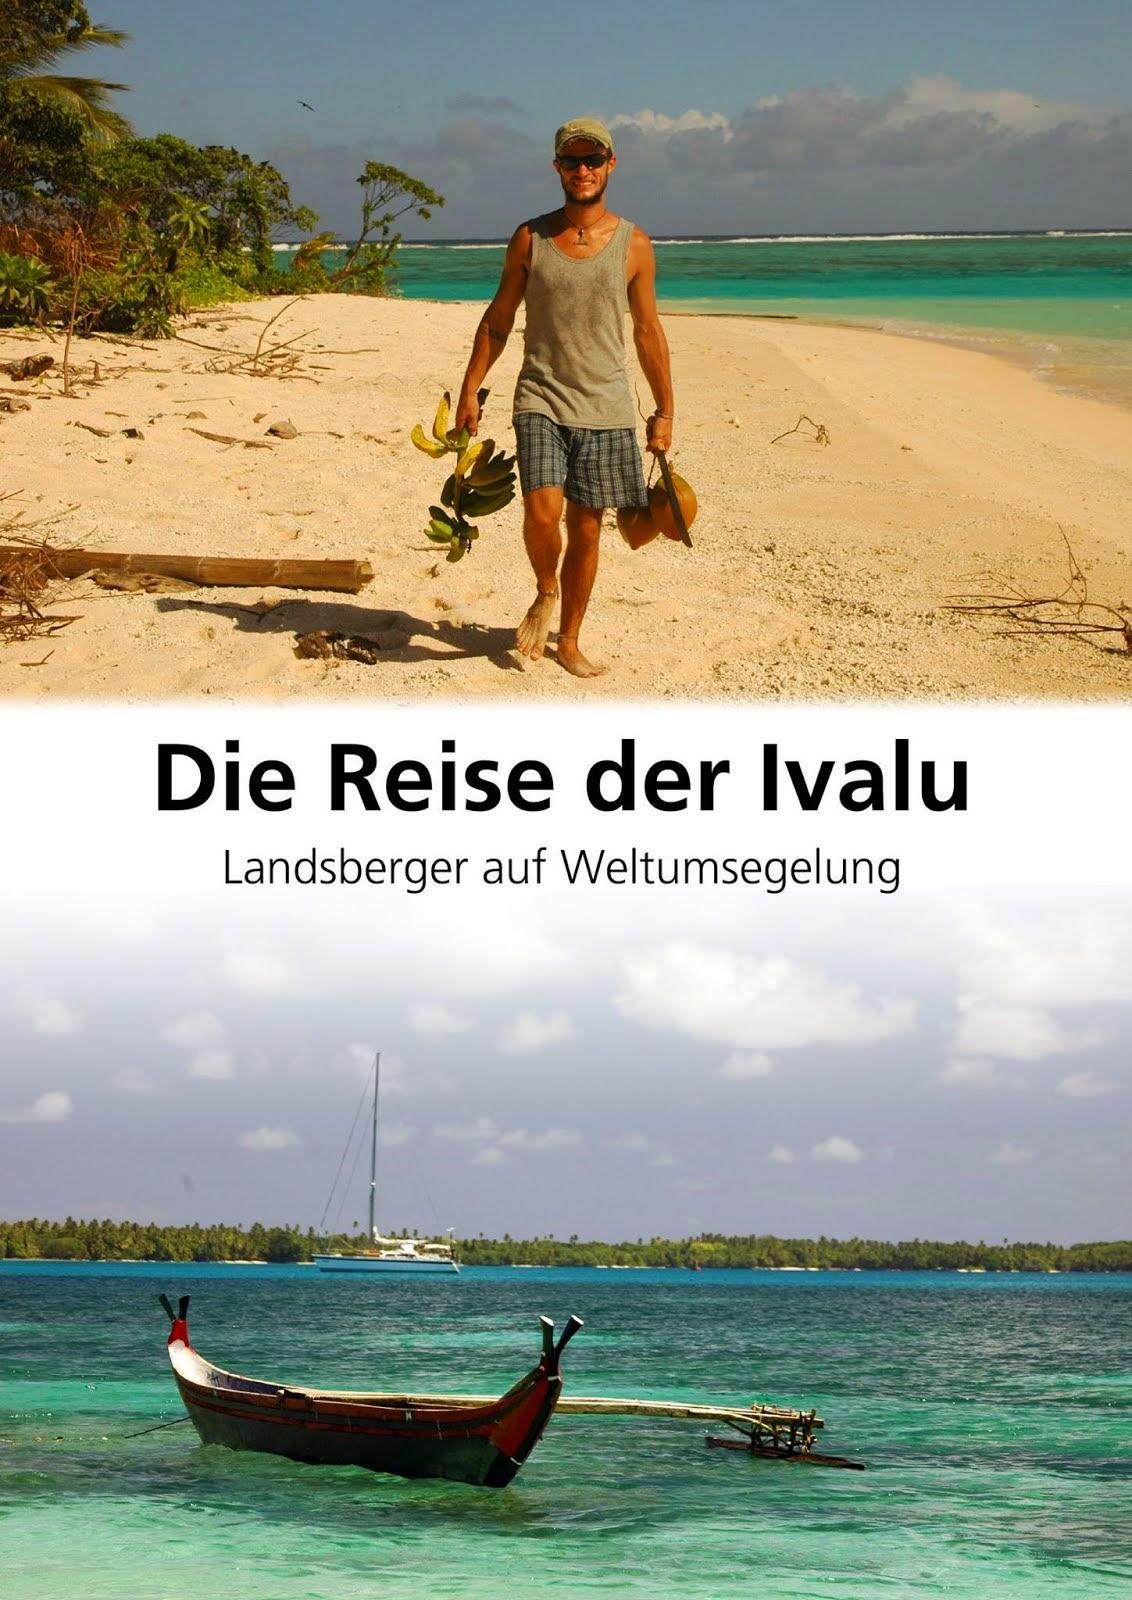 """Die Reise der Ivalu"" im Kino"